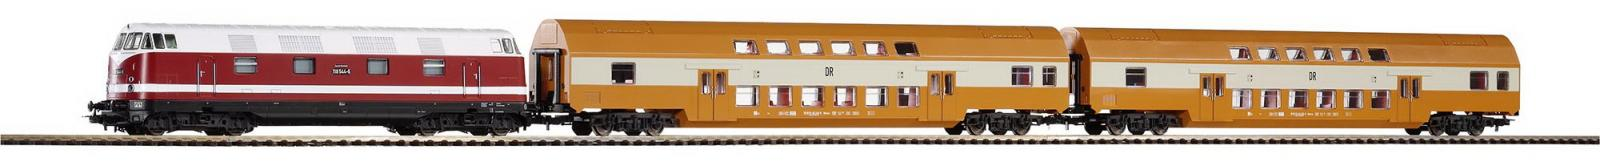 piko 57135 startset br118 doppelstockzug gleisoval neu ovp dhl versand ebay. Black Bedroom Furniture Sets. Home Design Ideas